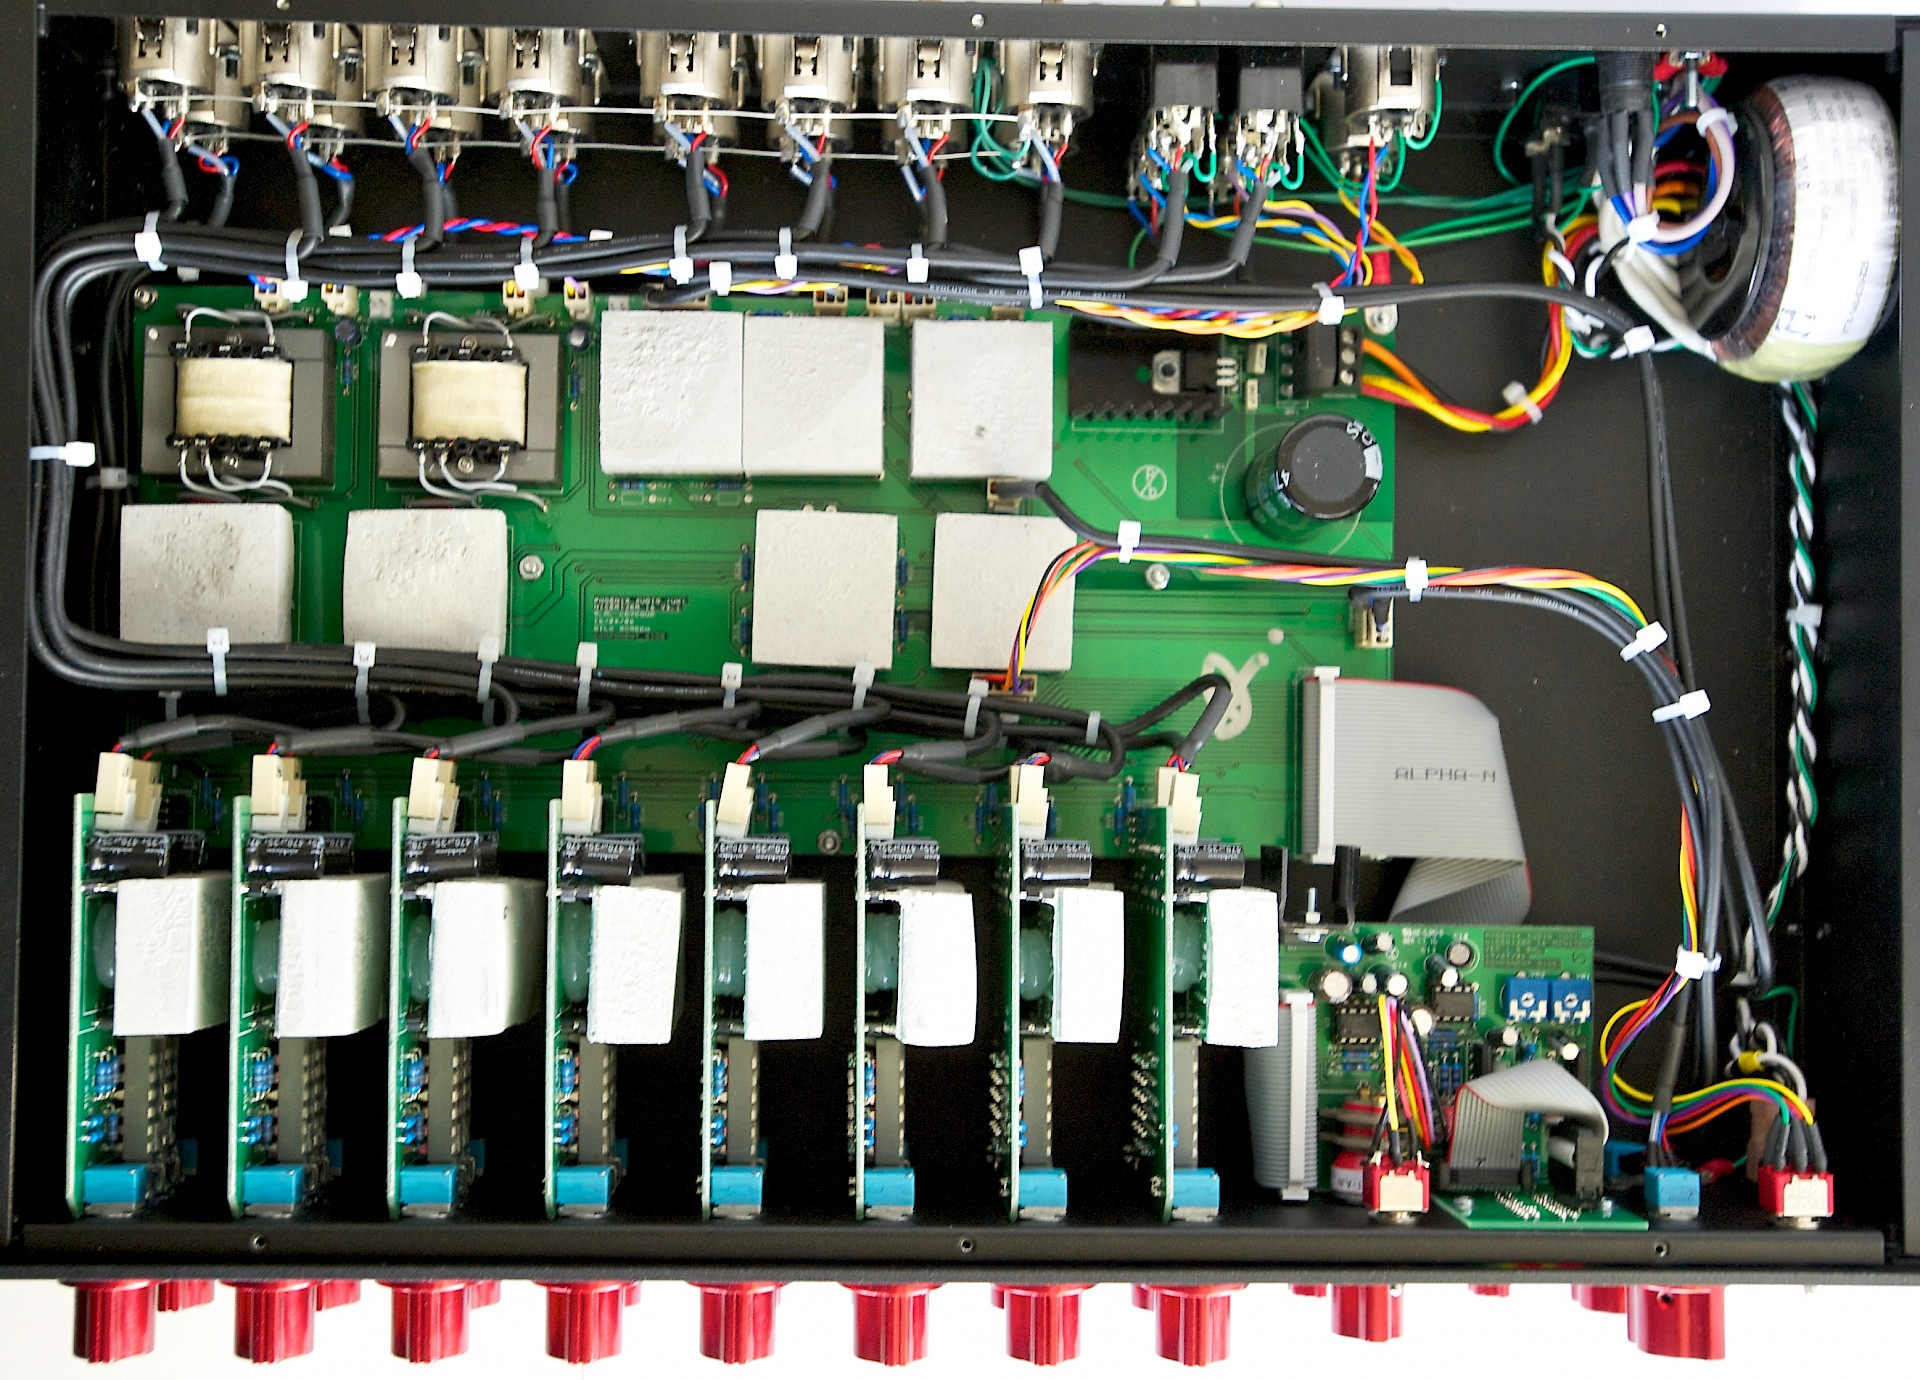 Nicerizer 16 Mk2 Phoenix Audio Supply Summing Amplifier For Mixer Circuit Schematic Diagram Inside View